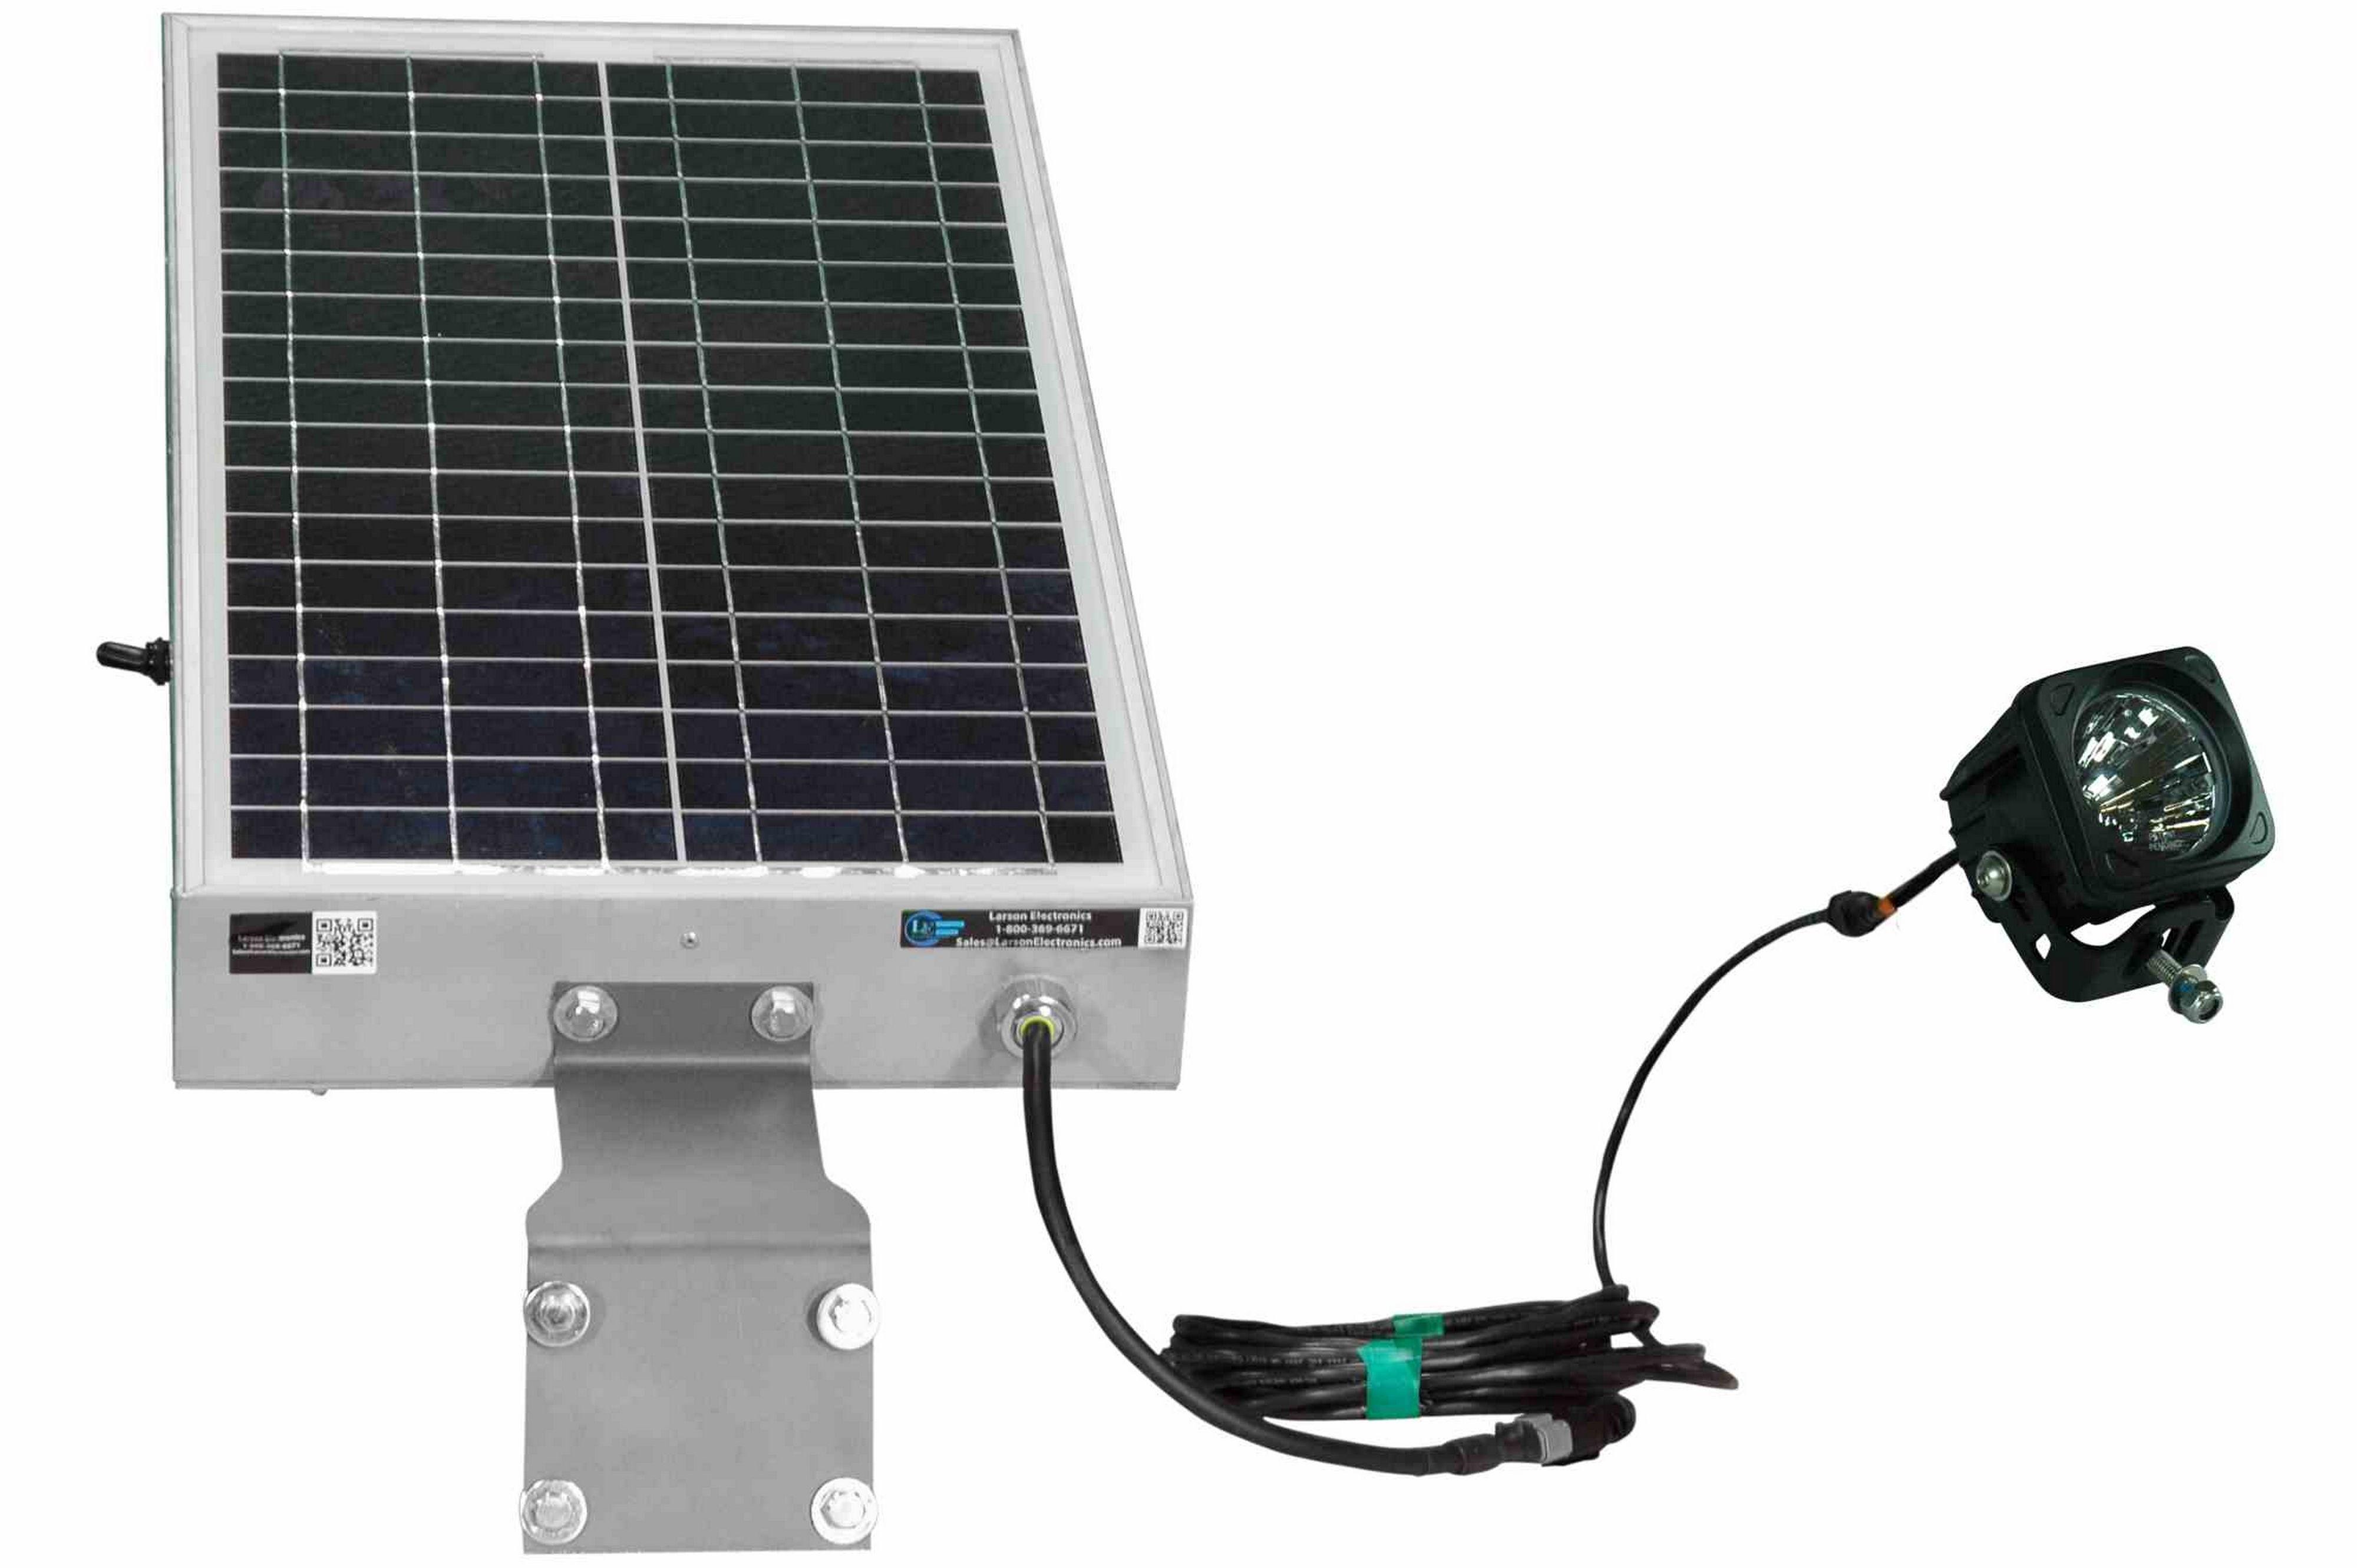 Solar Powered 10 Watt Led Light 12 Hour Run Time Day